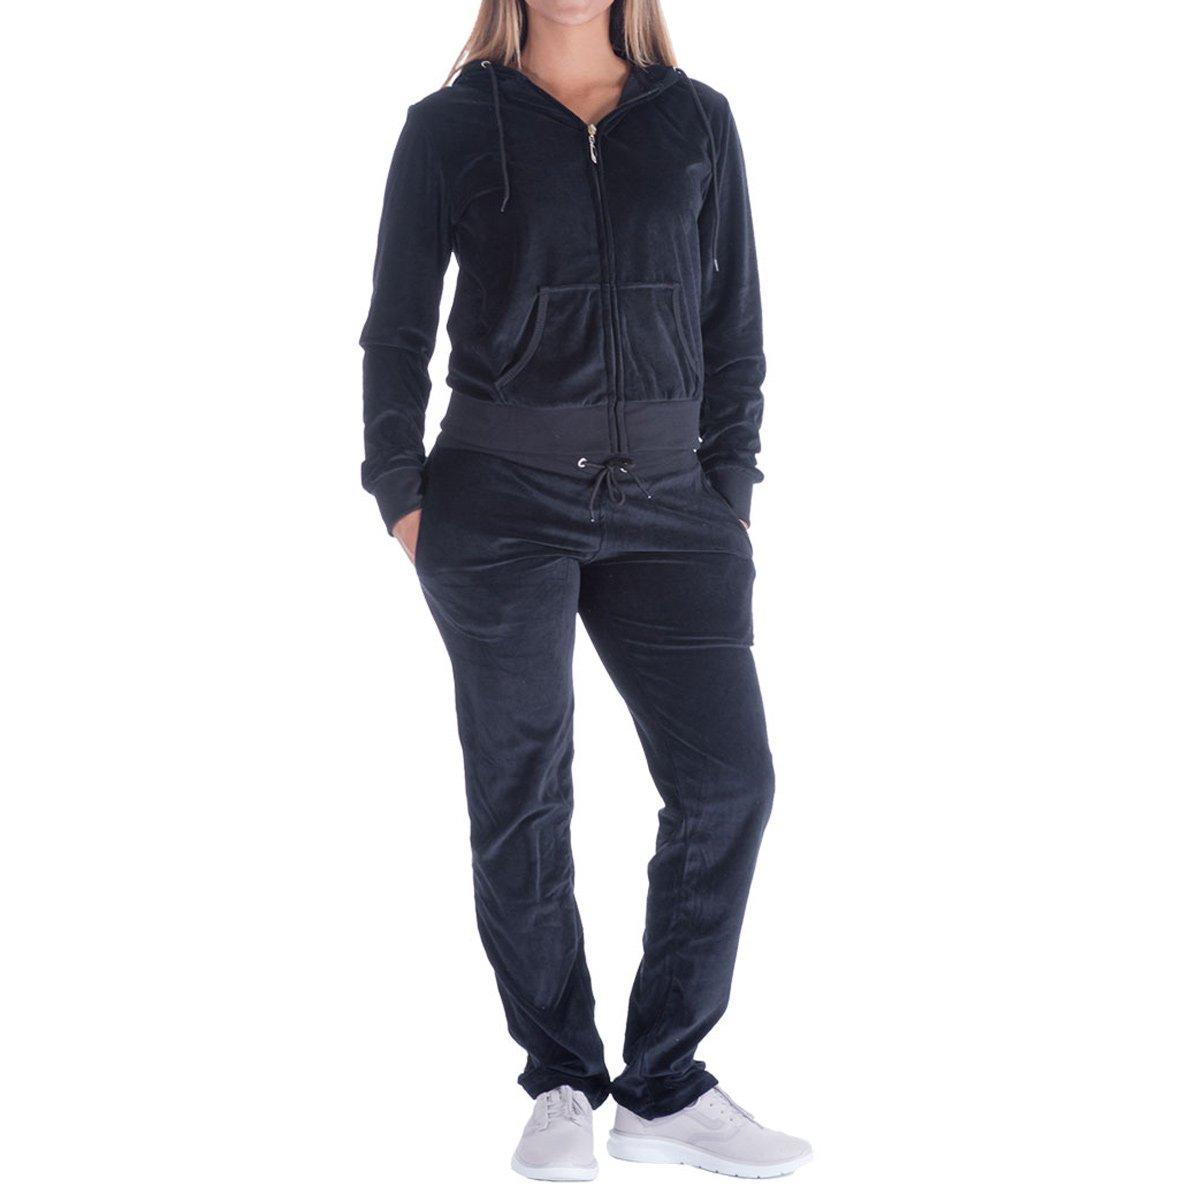 3c30c6ee90 Women's 2 Piece Outfits Velvet Zip Hoodie Sweatshirt & Sweatpants  Sweatsuits and Velour Tracksuit Sets Jogging Suit at Amazon Women's Clothing  store: